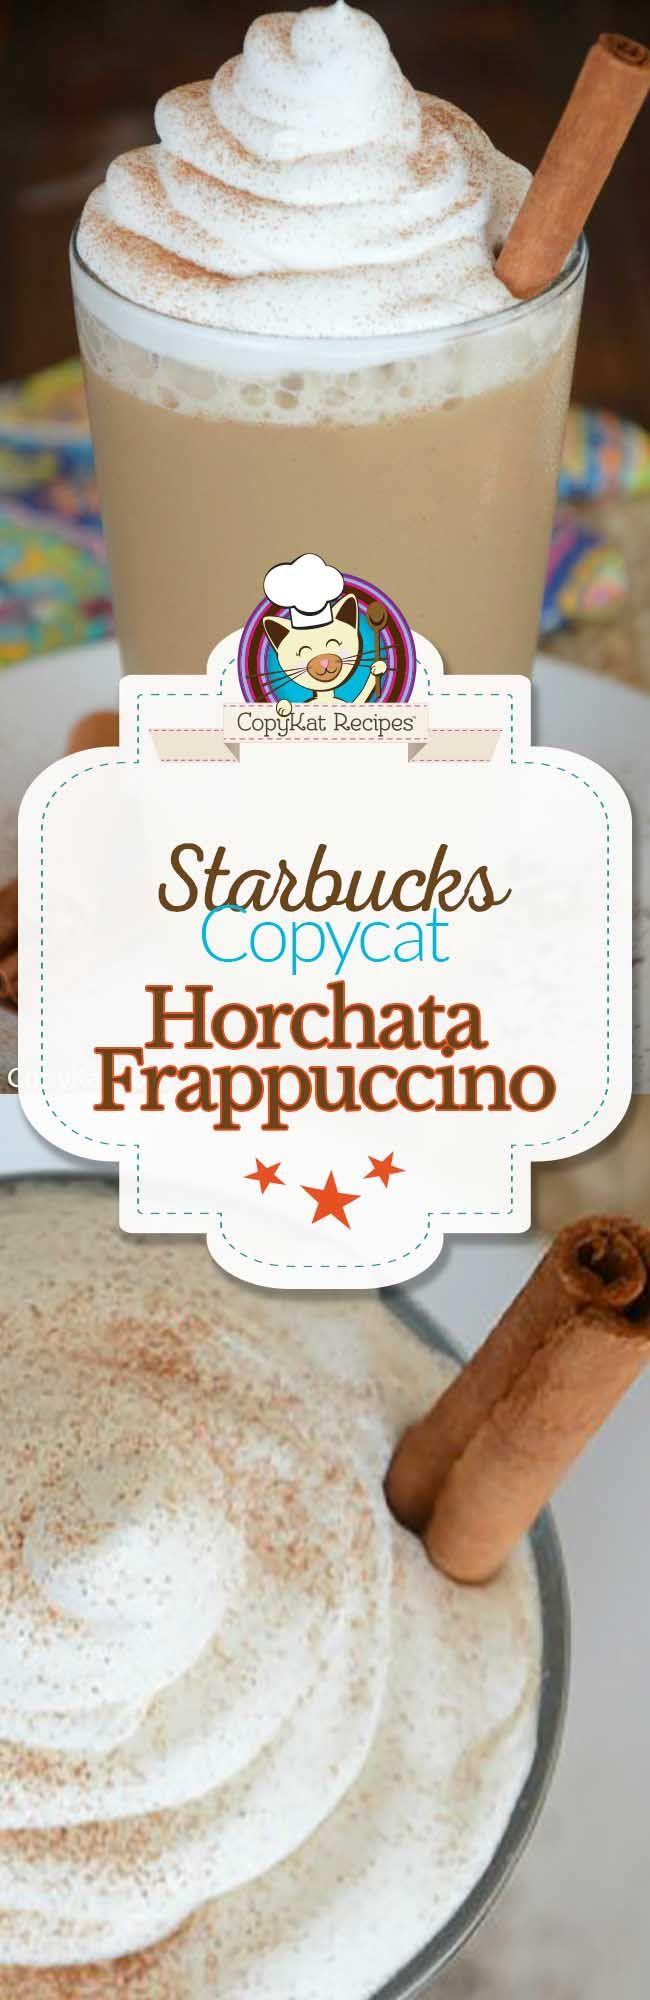 Starbucks Horchata Frappuccino